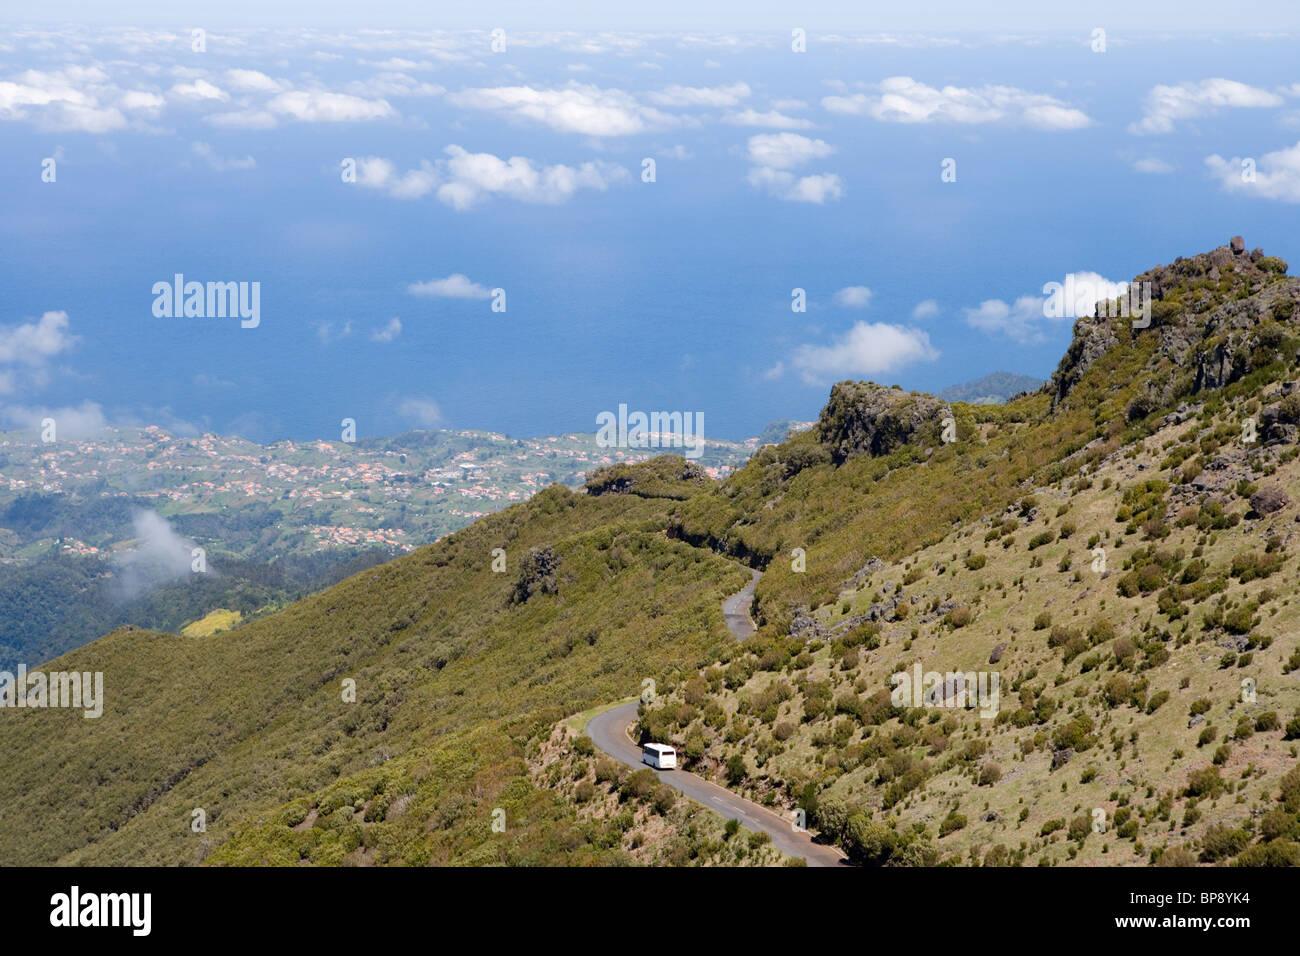 Bus on Road to Pico Ruivo with View of Santana, Achada do Teixeira, Madeira, Portugal - Stock Image